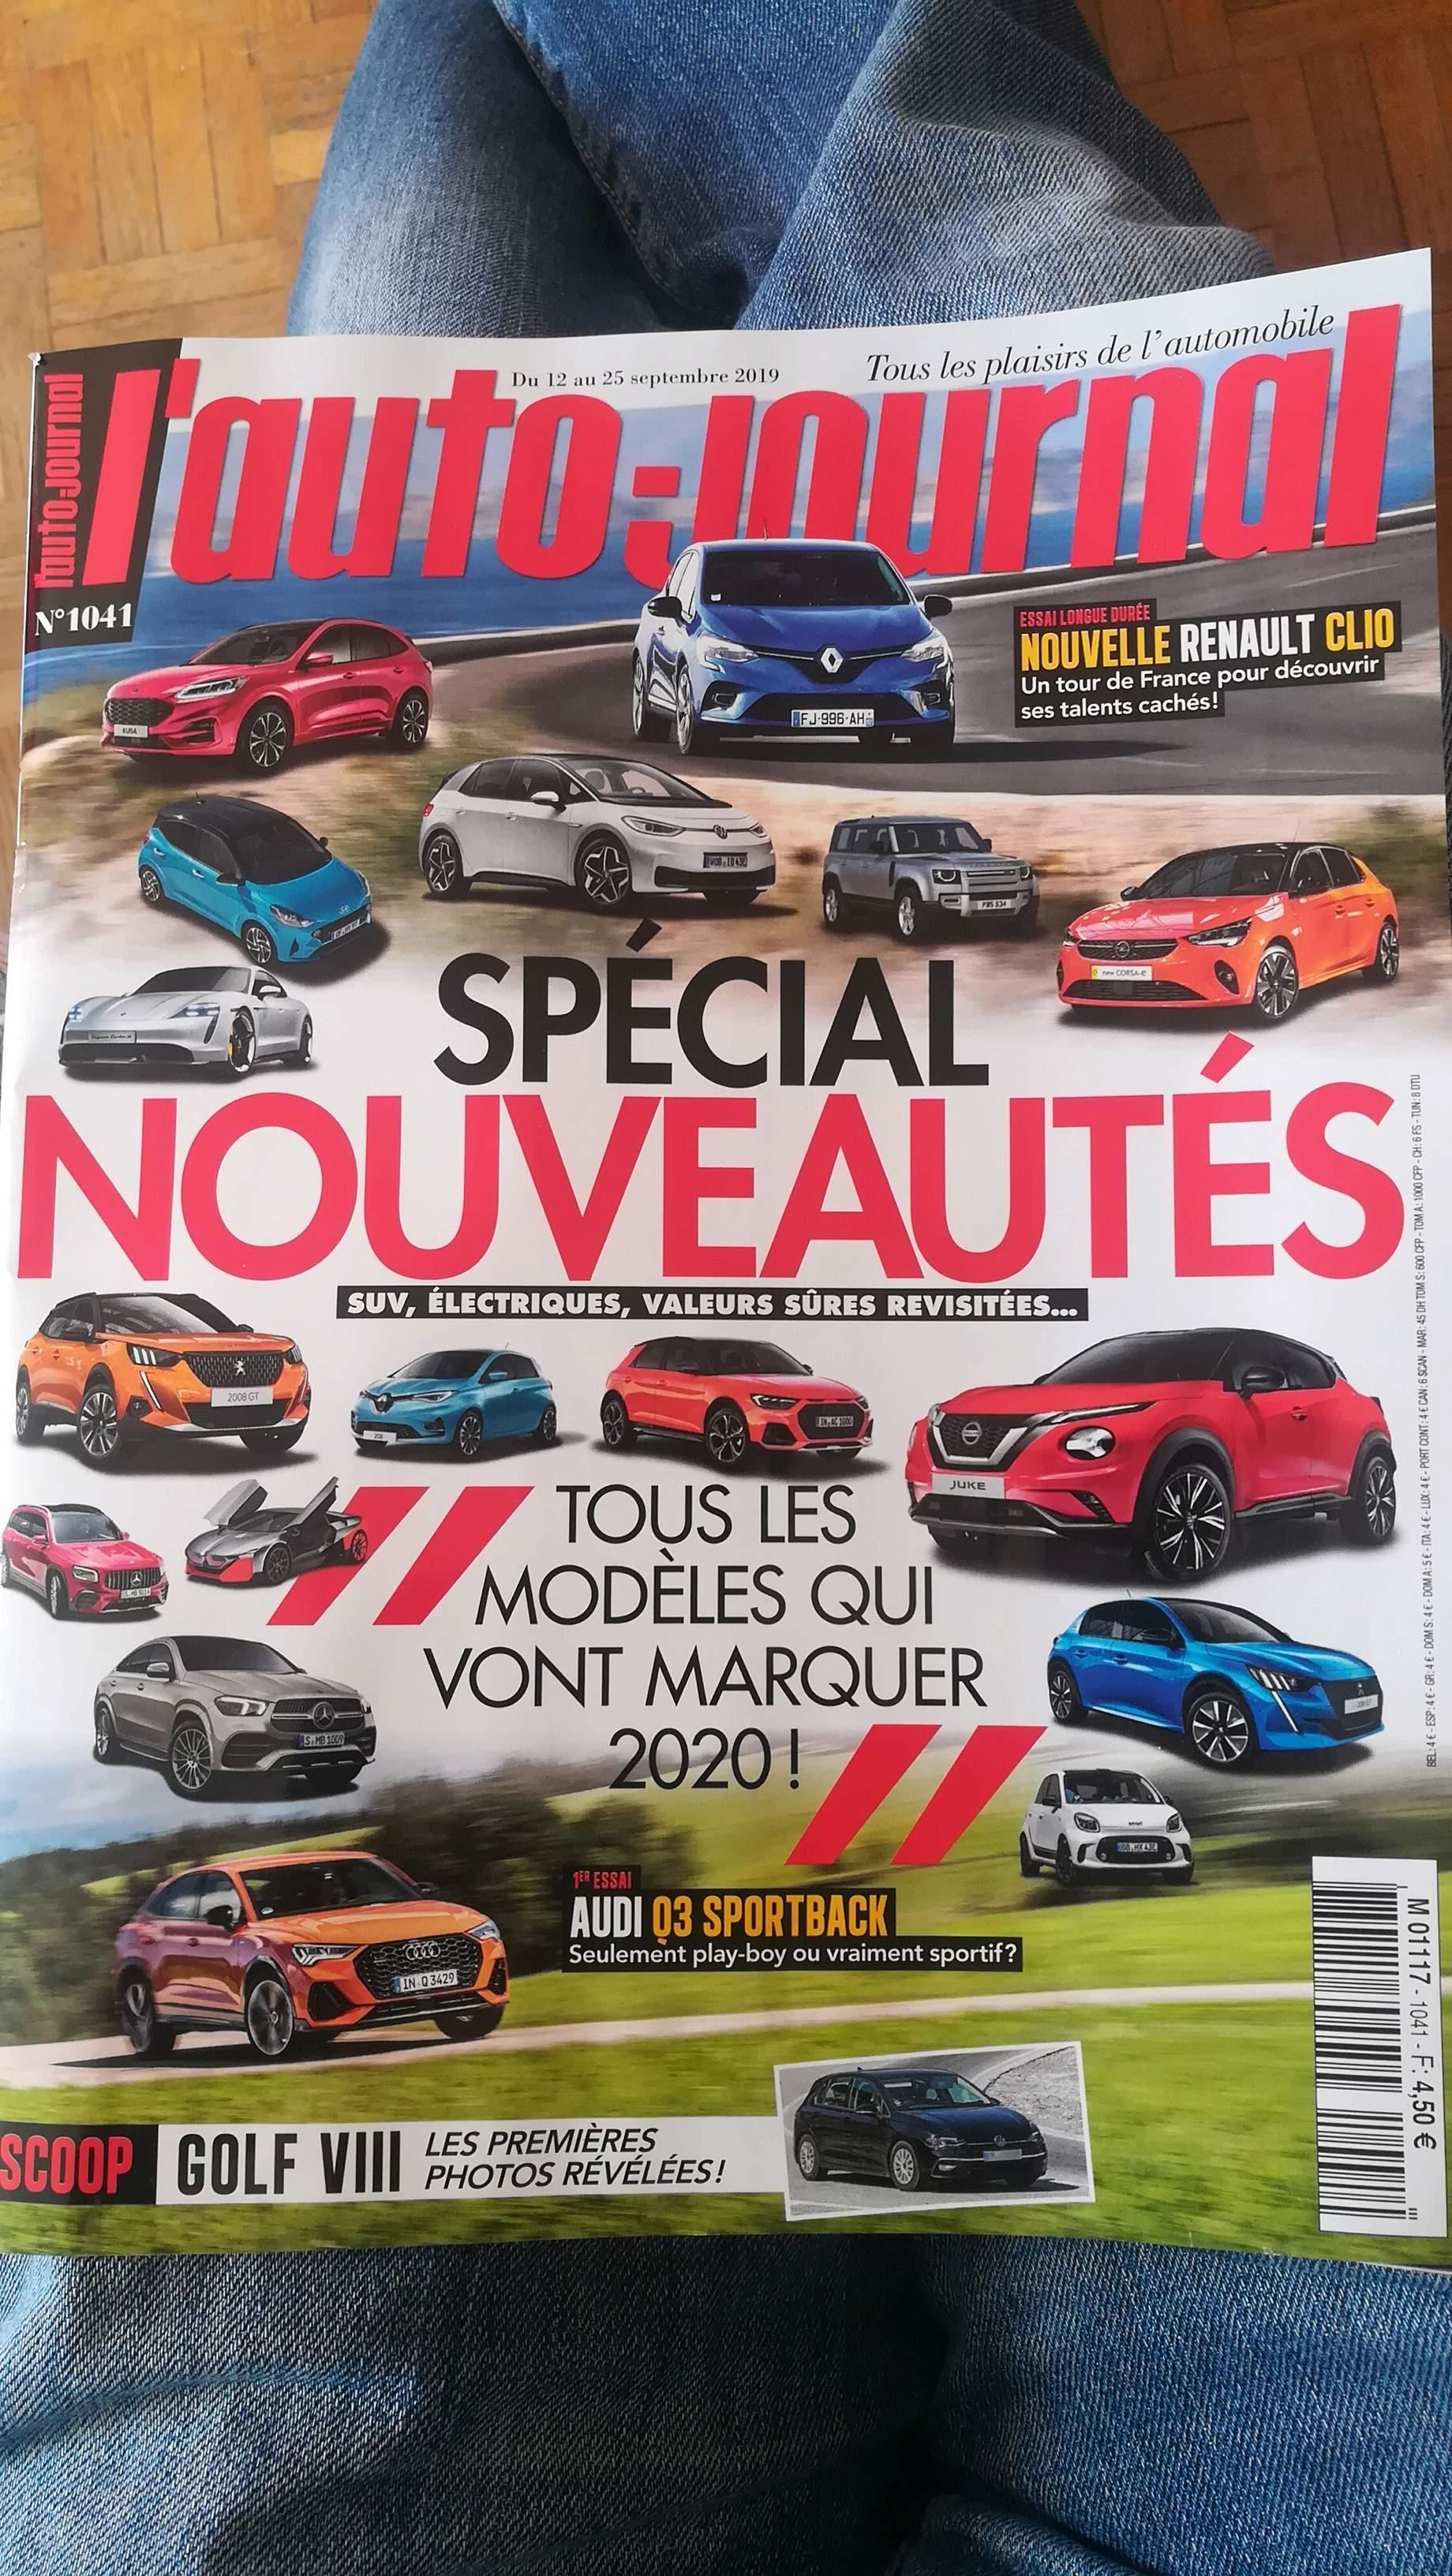 [Presse] Les magazines auto ! - Page 25 Img_2185